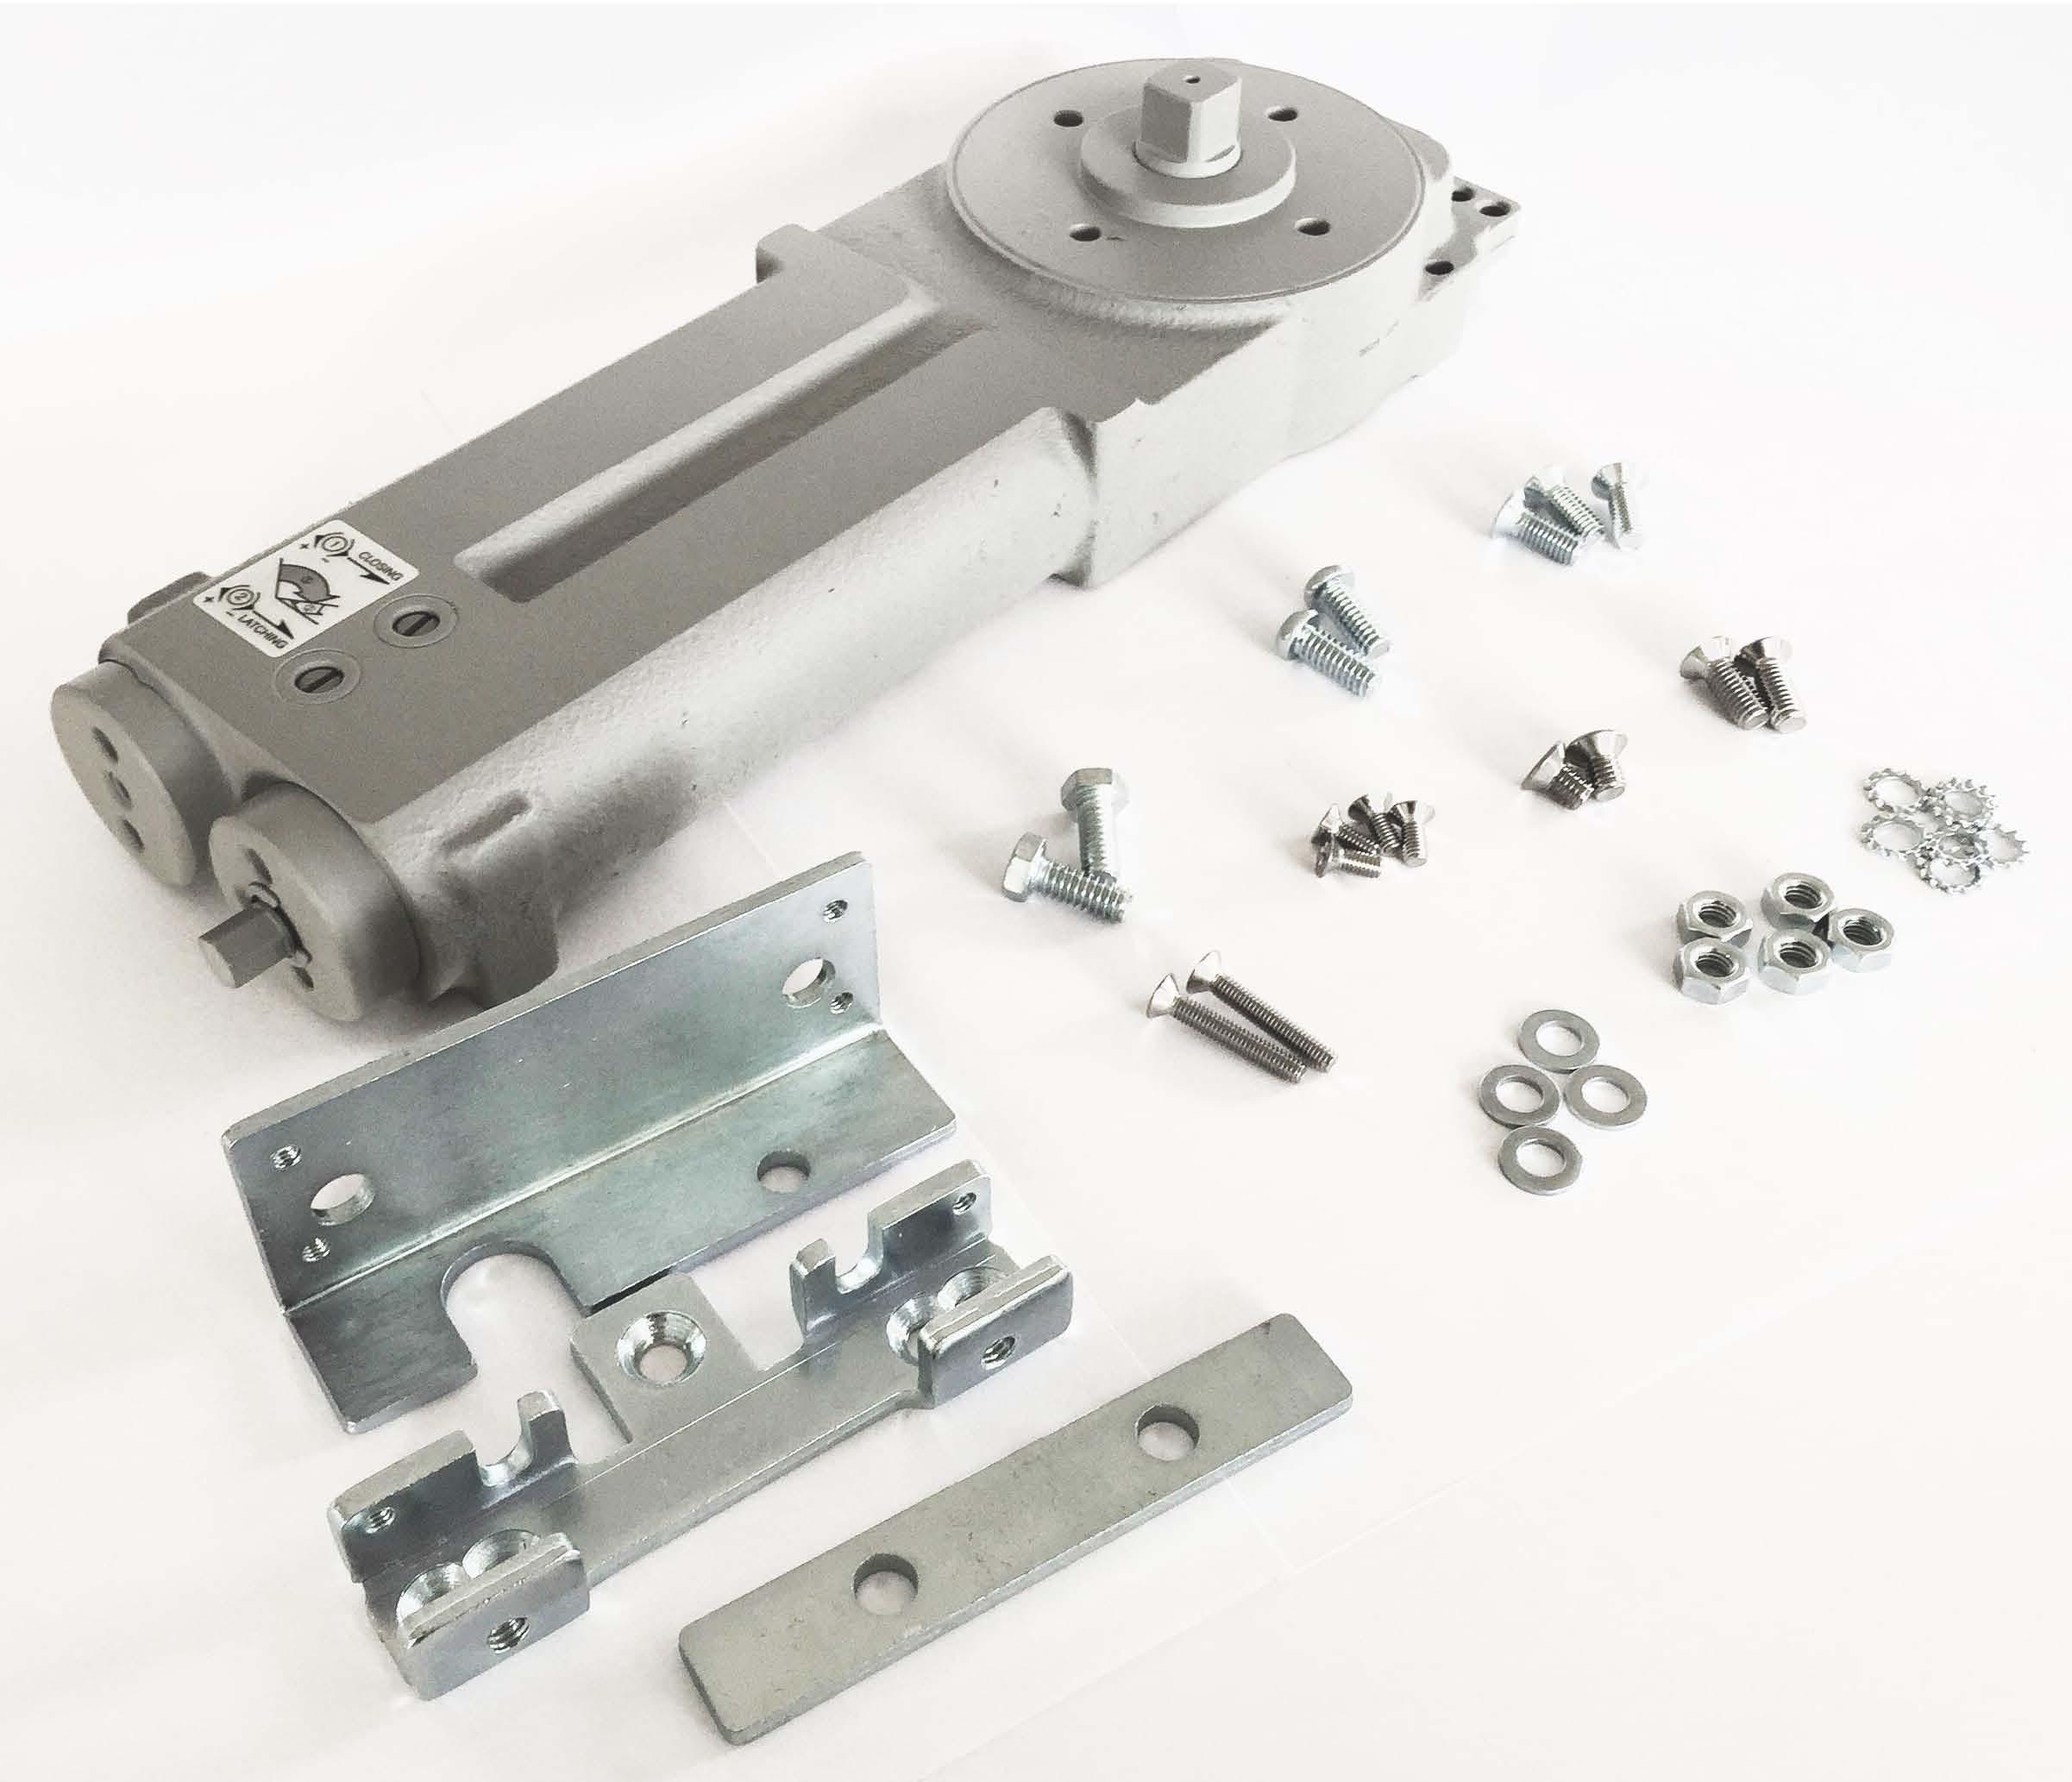 Tc9900 Adjustable Transom Closer Axim